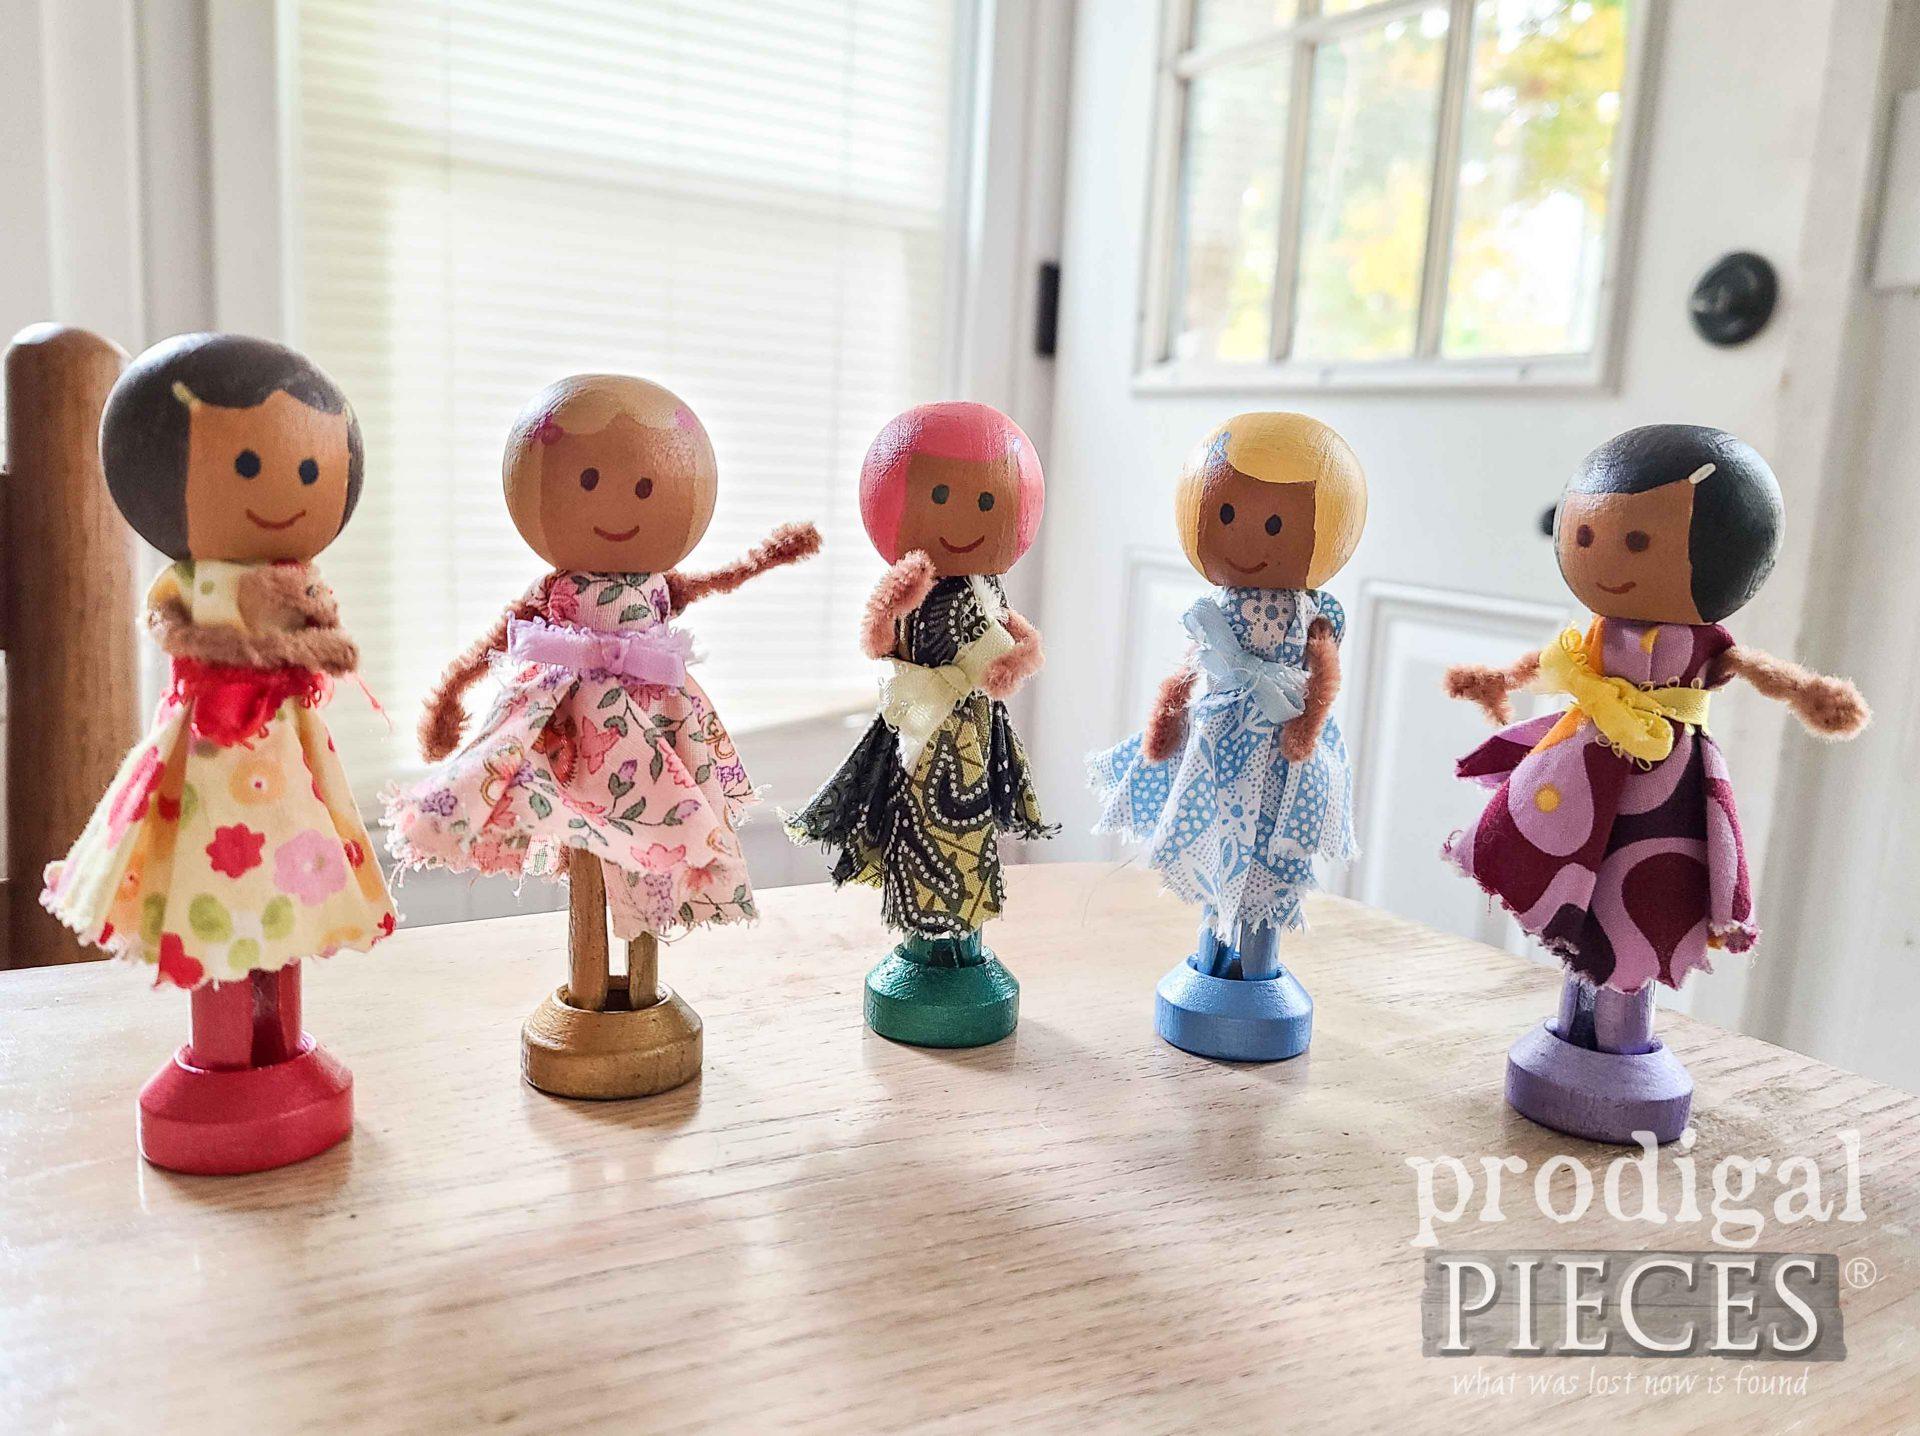 DIY Clothespin Dolls | prodigalpieces.com